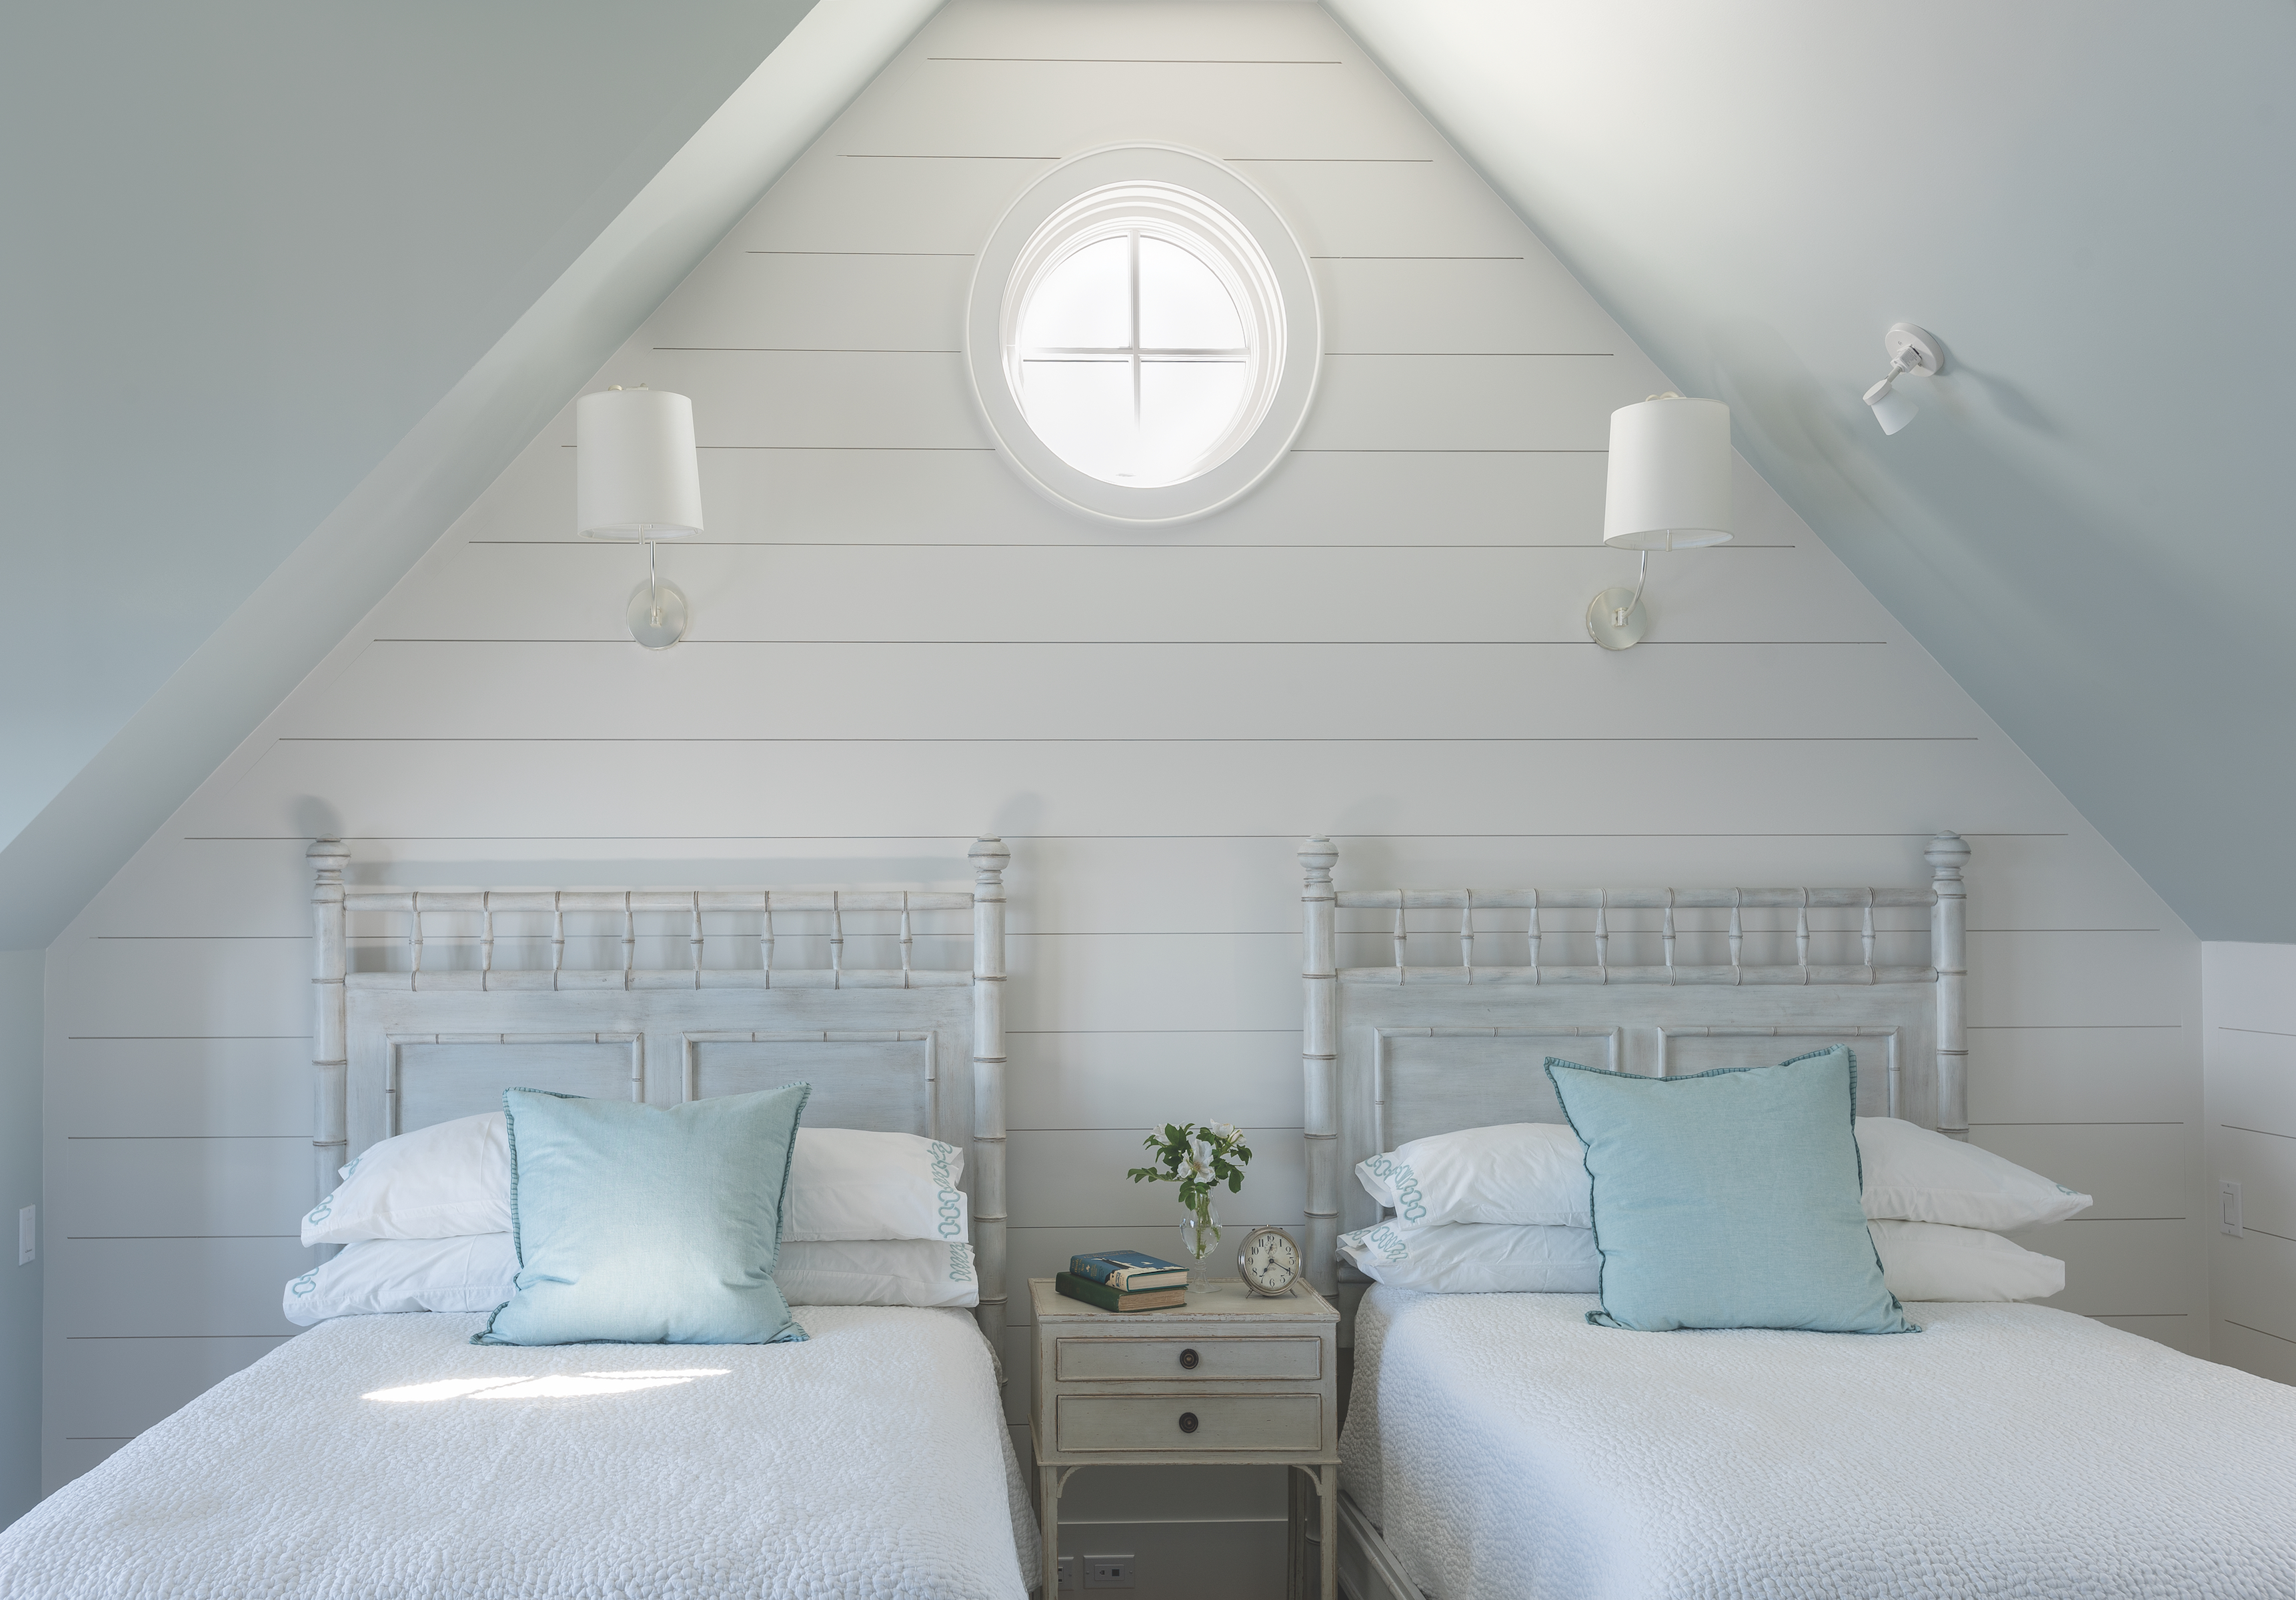 Guest Bedroom at Ship's Channel, Cape Elizabeth by Banks Design Associates Ltd.